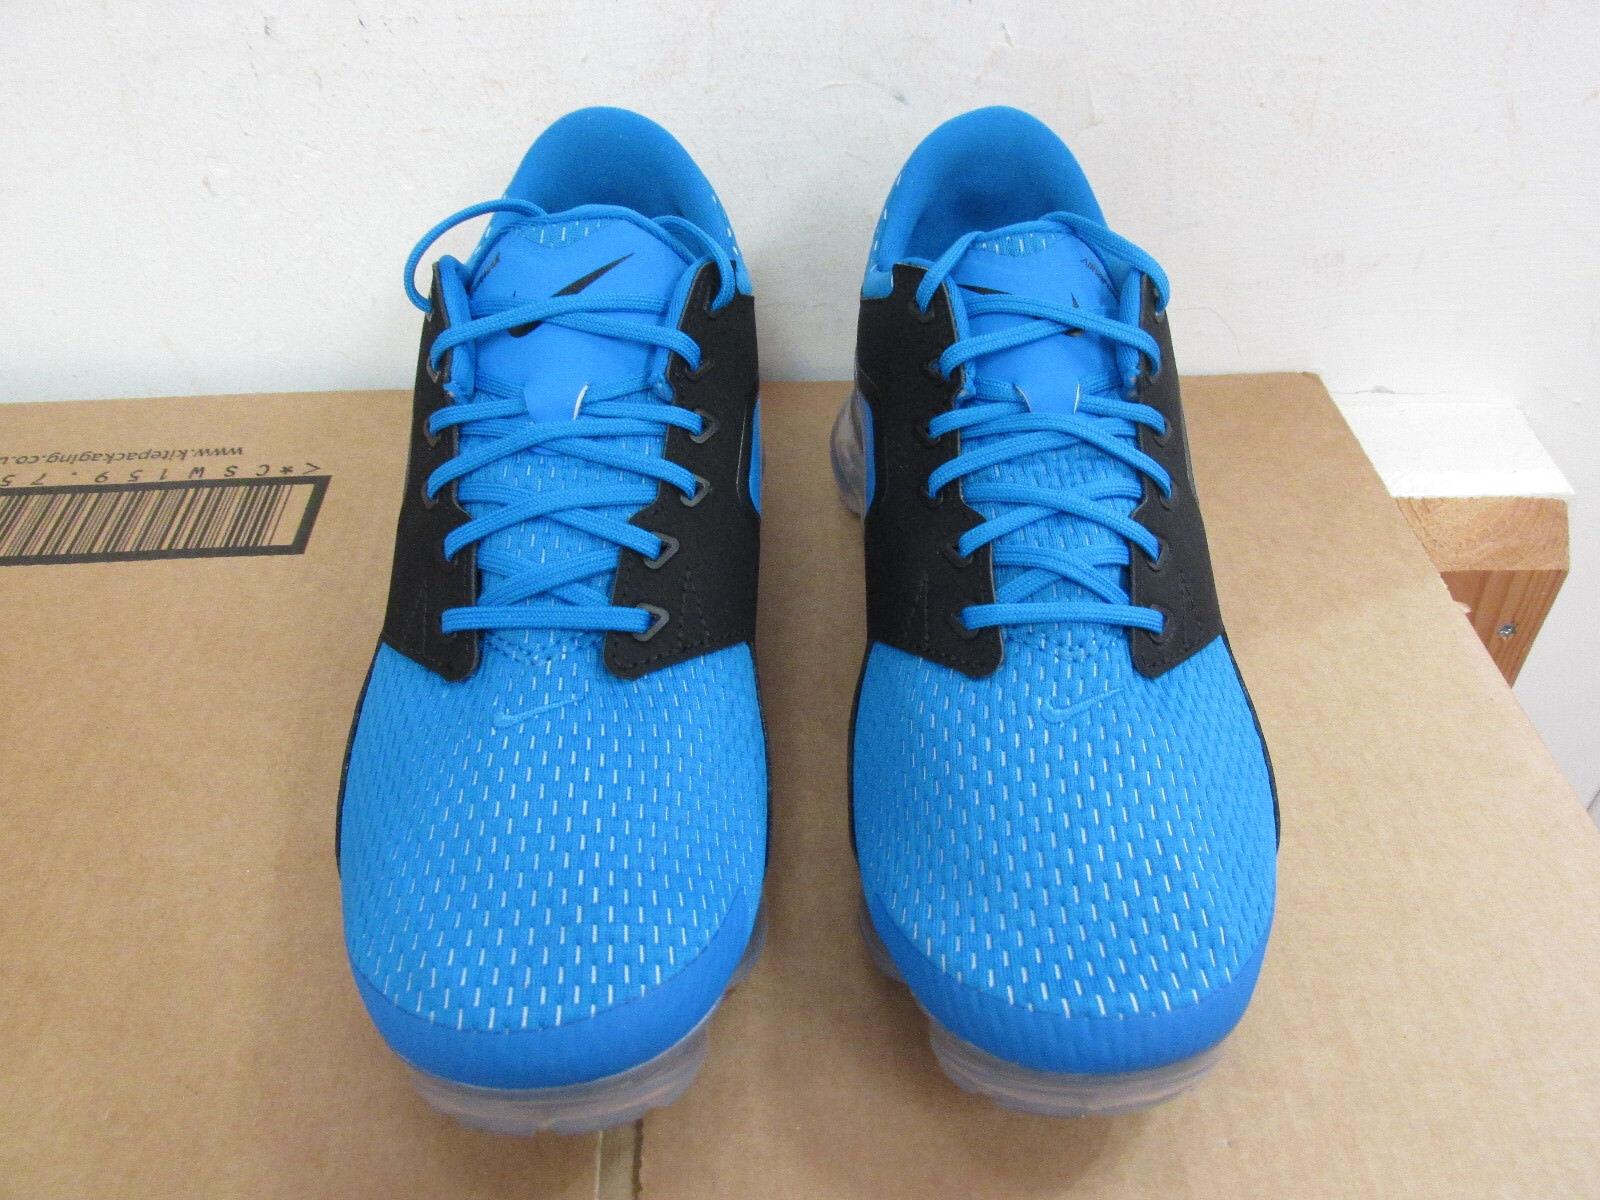 Nike Air Scarpe Da Ginnastica Da Uomo Corsa Vapormax Scarpe AH9046 400 Scarpe Vapormax Da Ginnastica Scarpe SVENDITA 494097